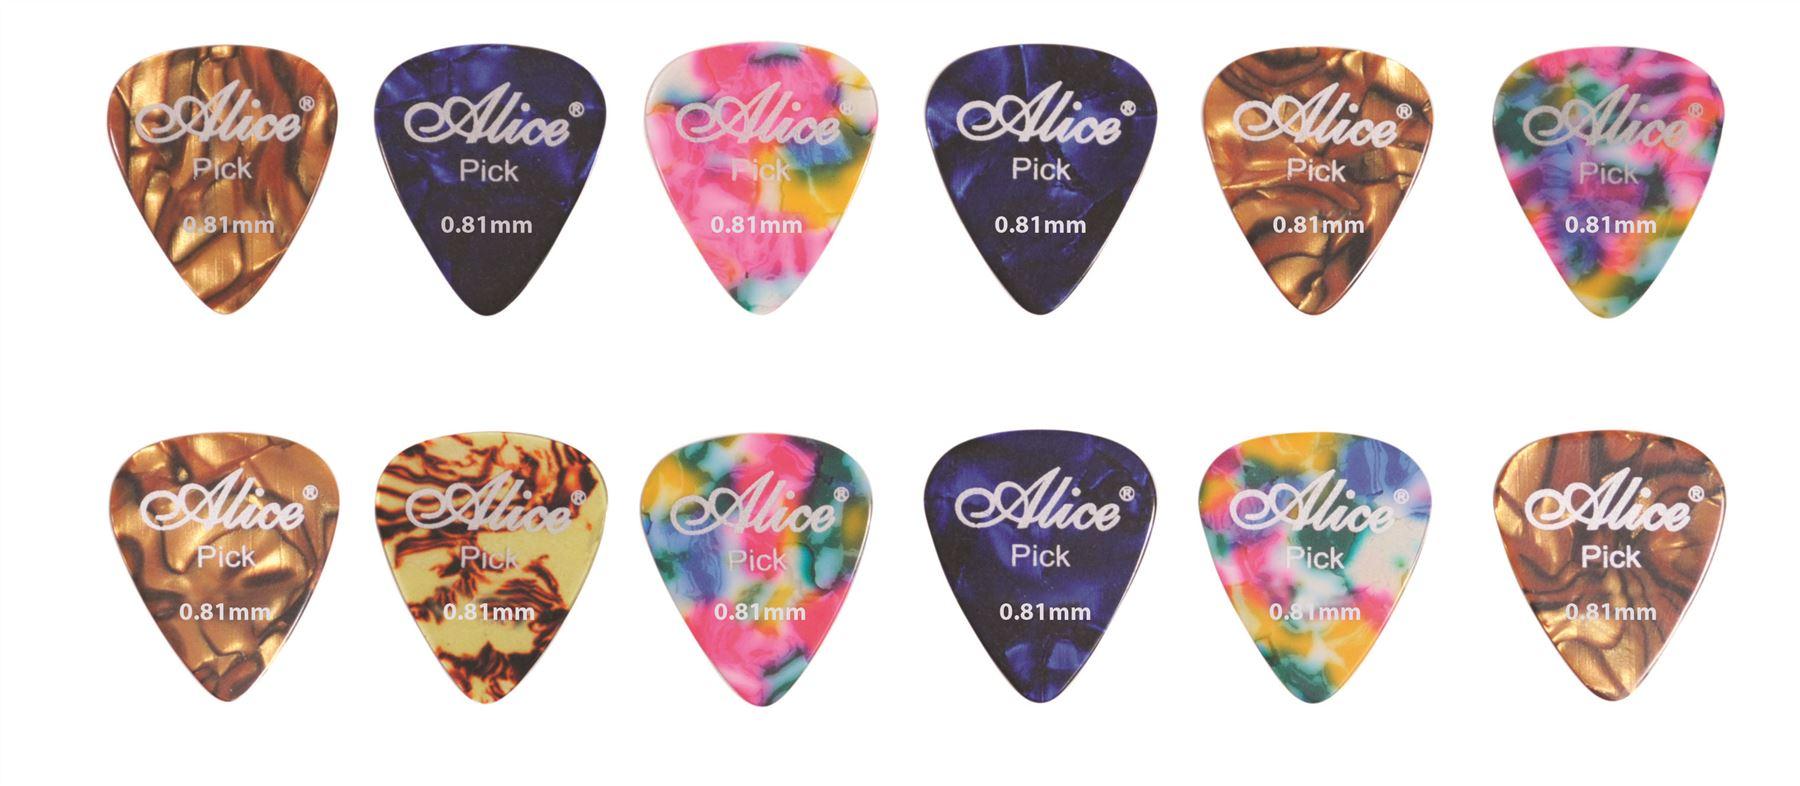 12 assorted colour celluloid guitar picks 3 designs ebay. Black Bedroom Furniture Sets. Home Design Ideas